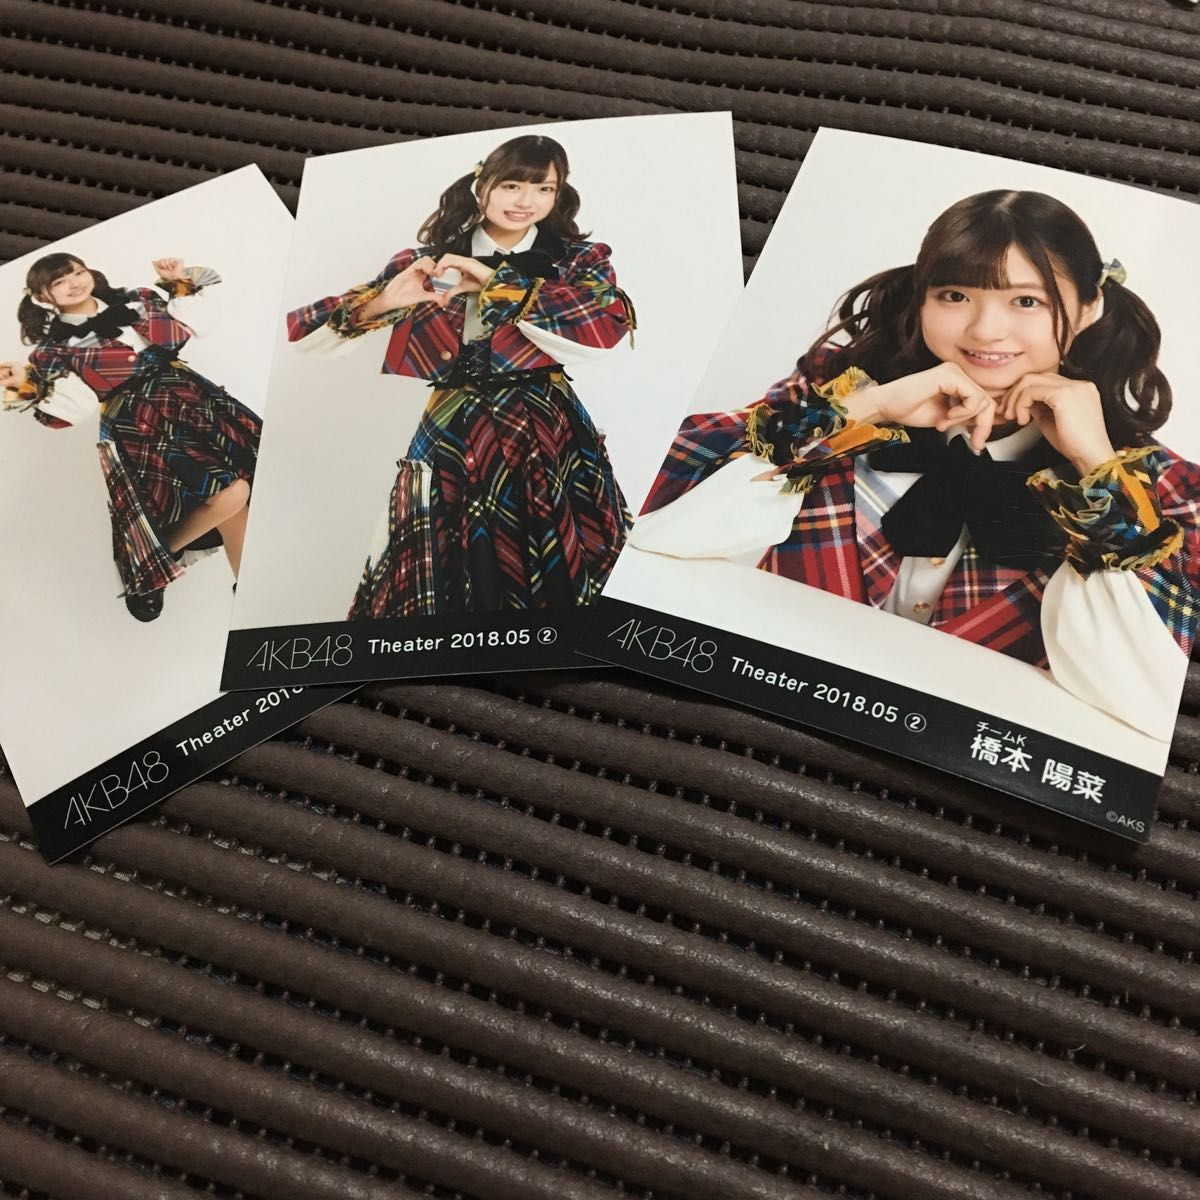 AKB48 月別生写真 2018 5月 MAY ② 3種 コンプ 橋本陽菜